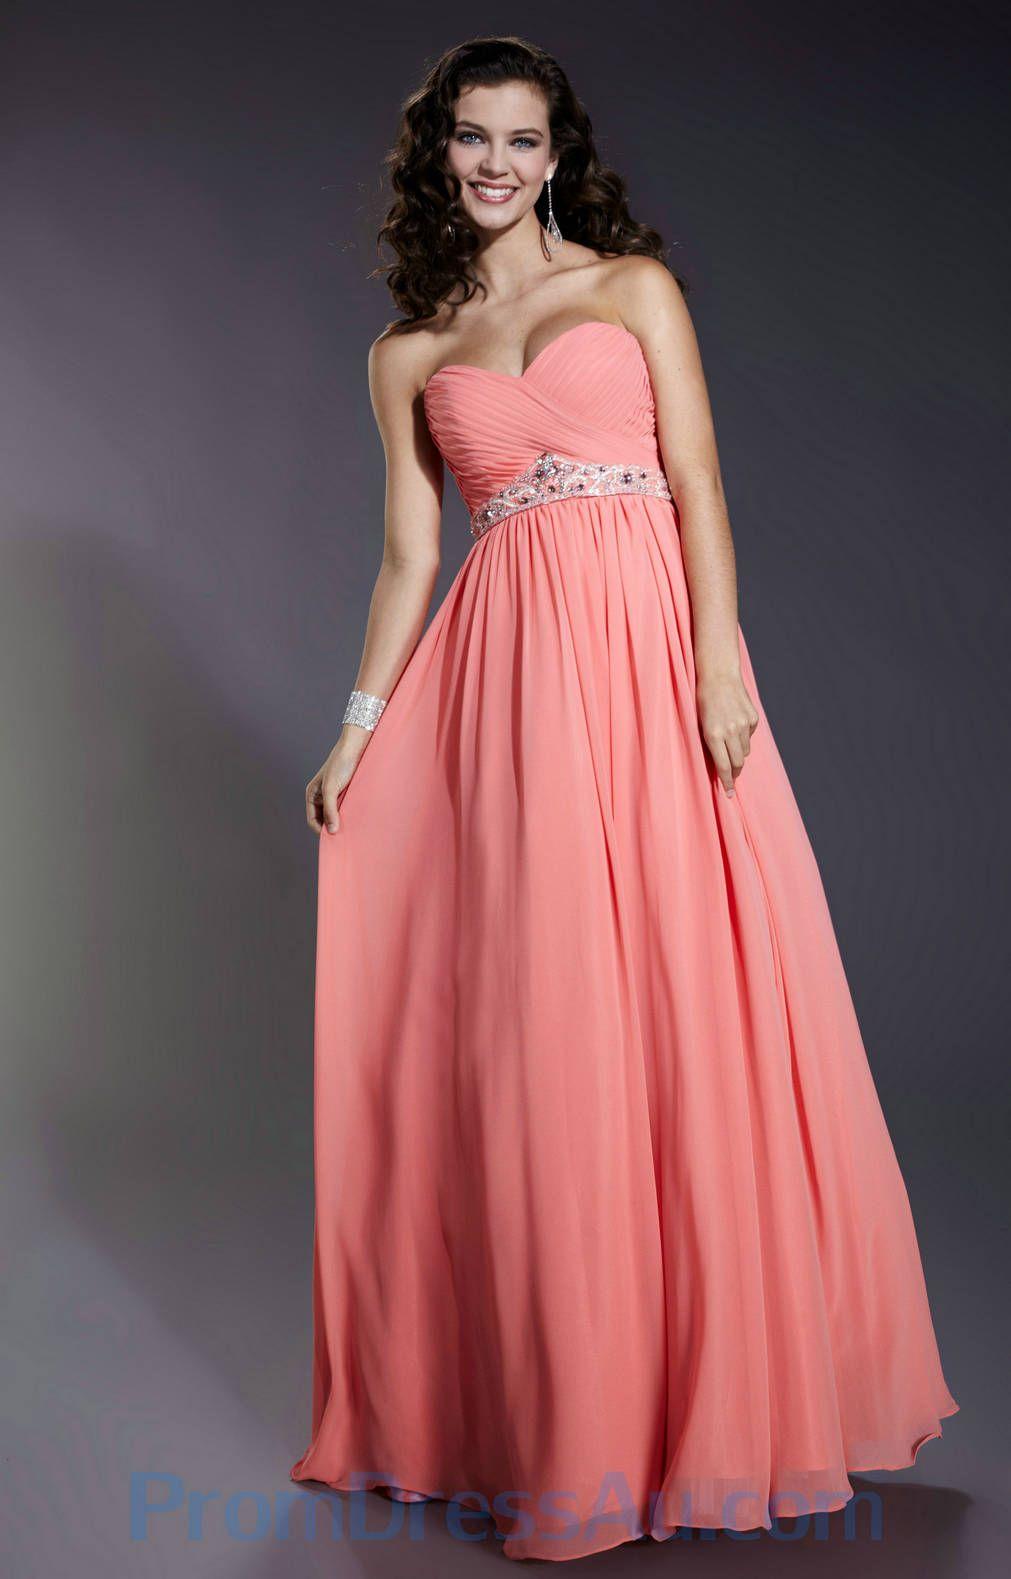 Funky Prom Dress Ontario Sketch - Colorful Wedding Dress Ideas ...